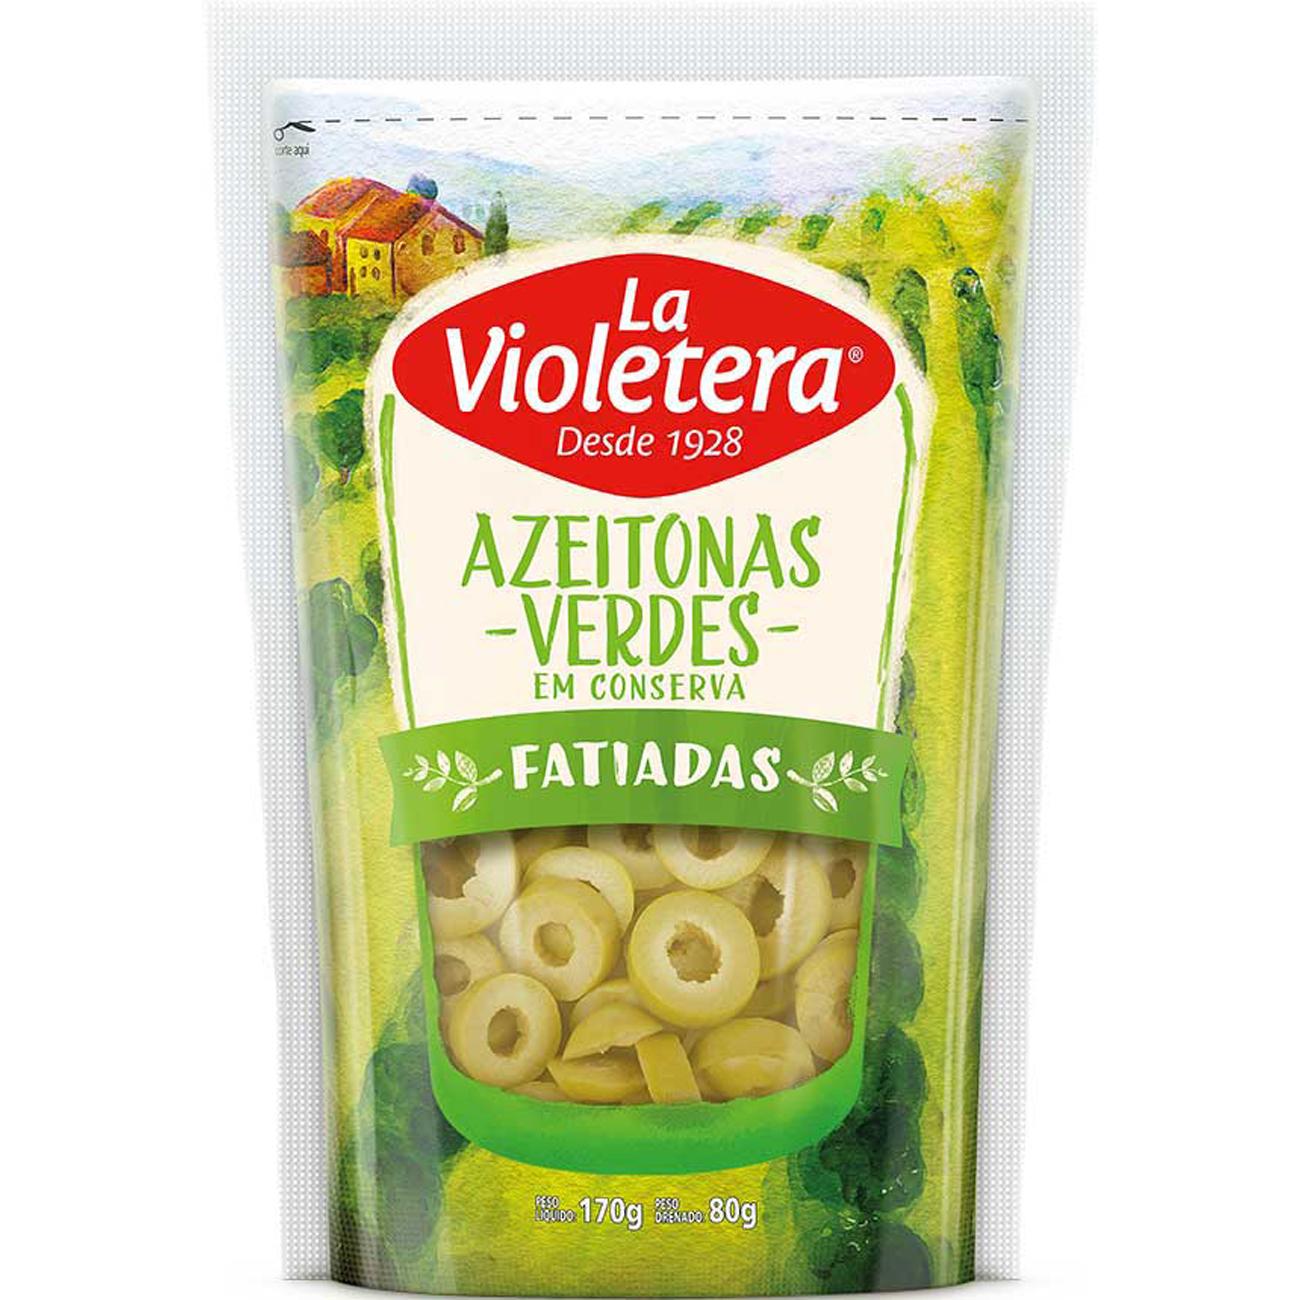 Azeitona La Violetera 80G Verde Fat Sc